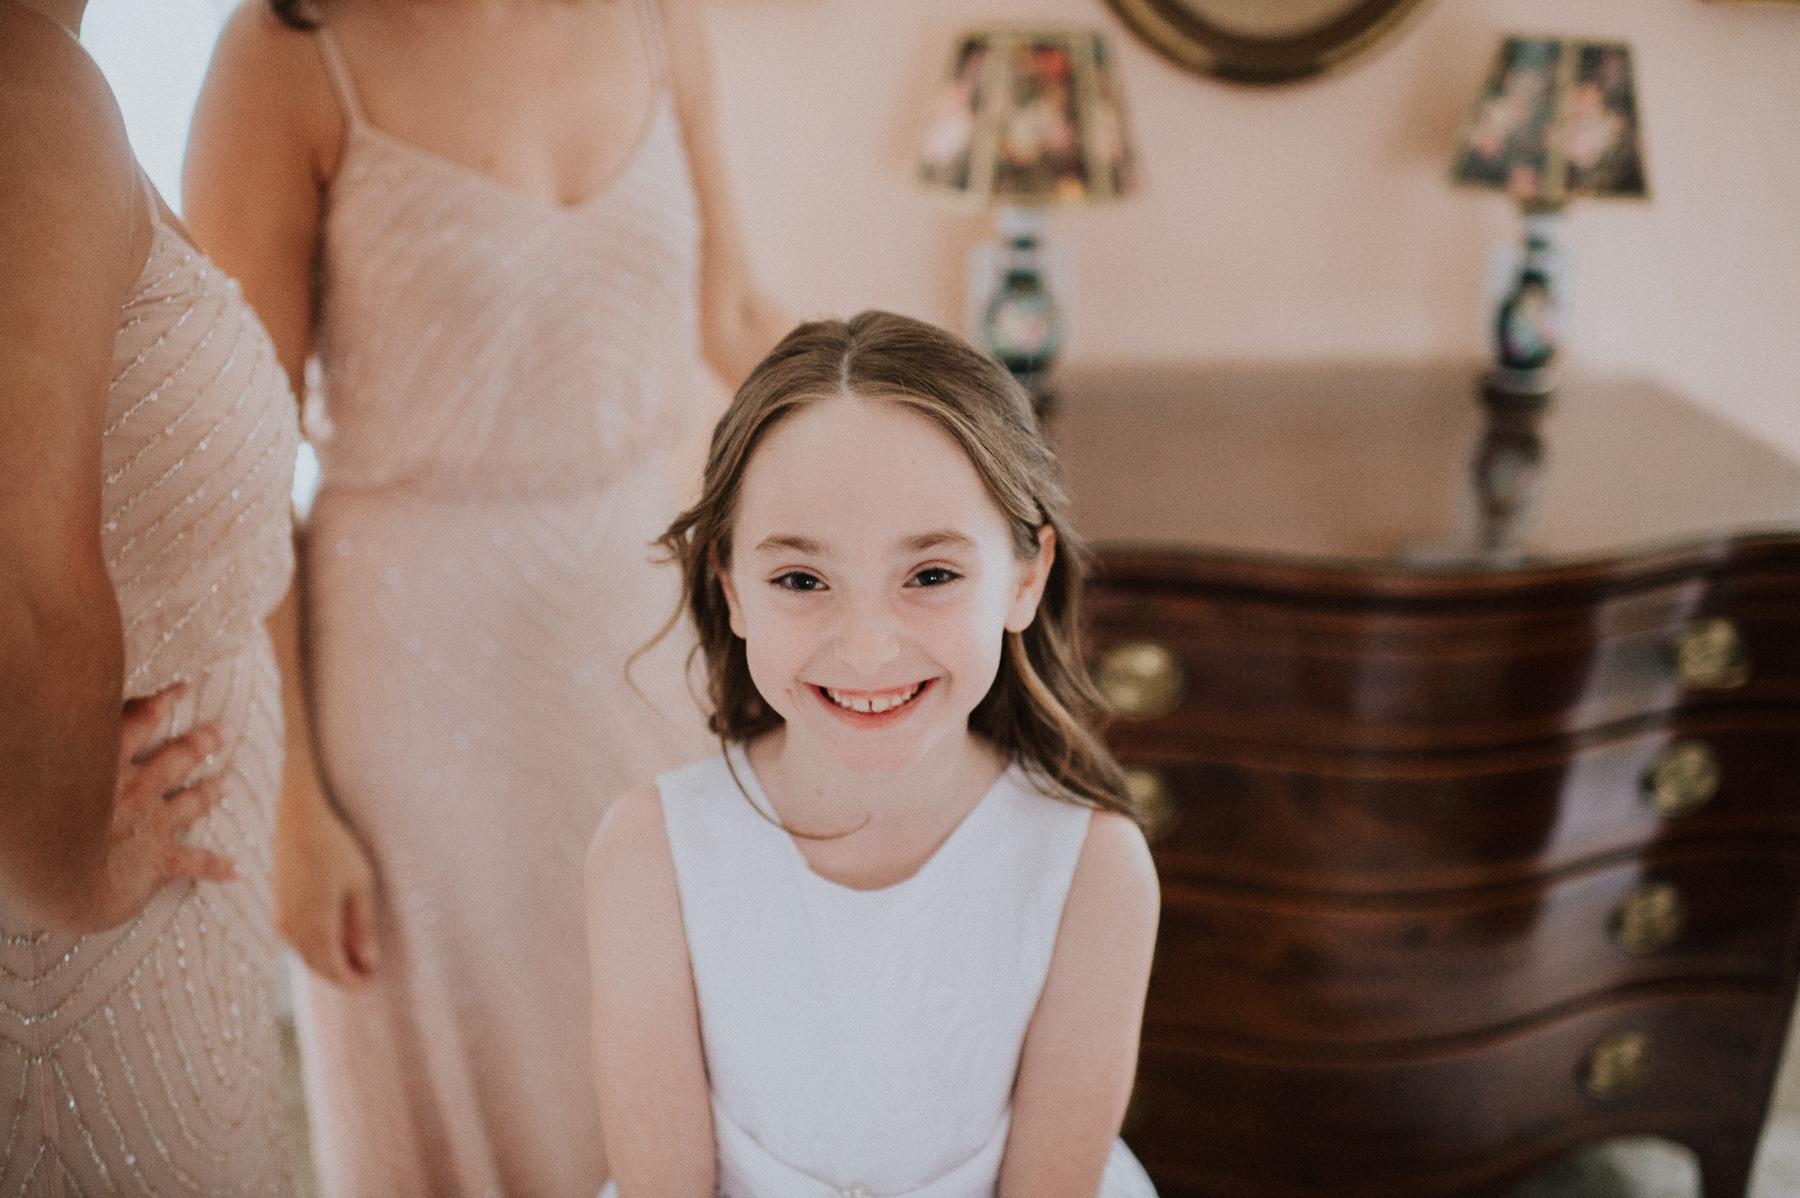 appleford-estate-wedding-photography-18.jpg